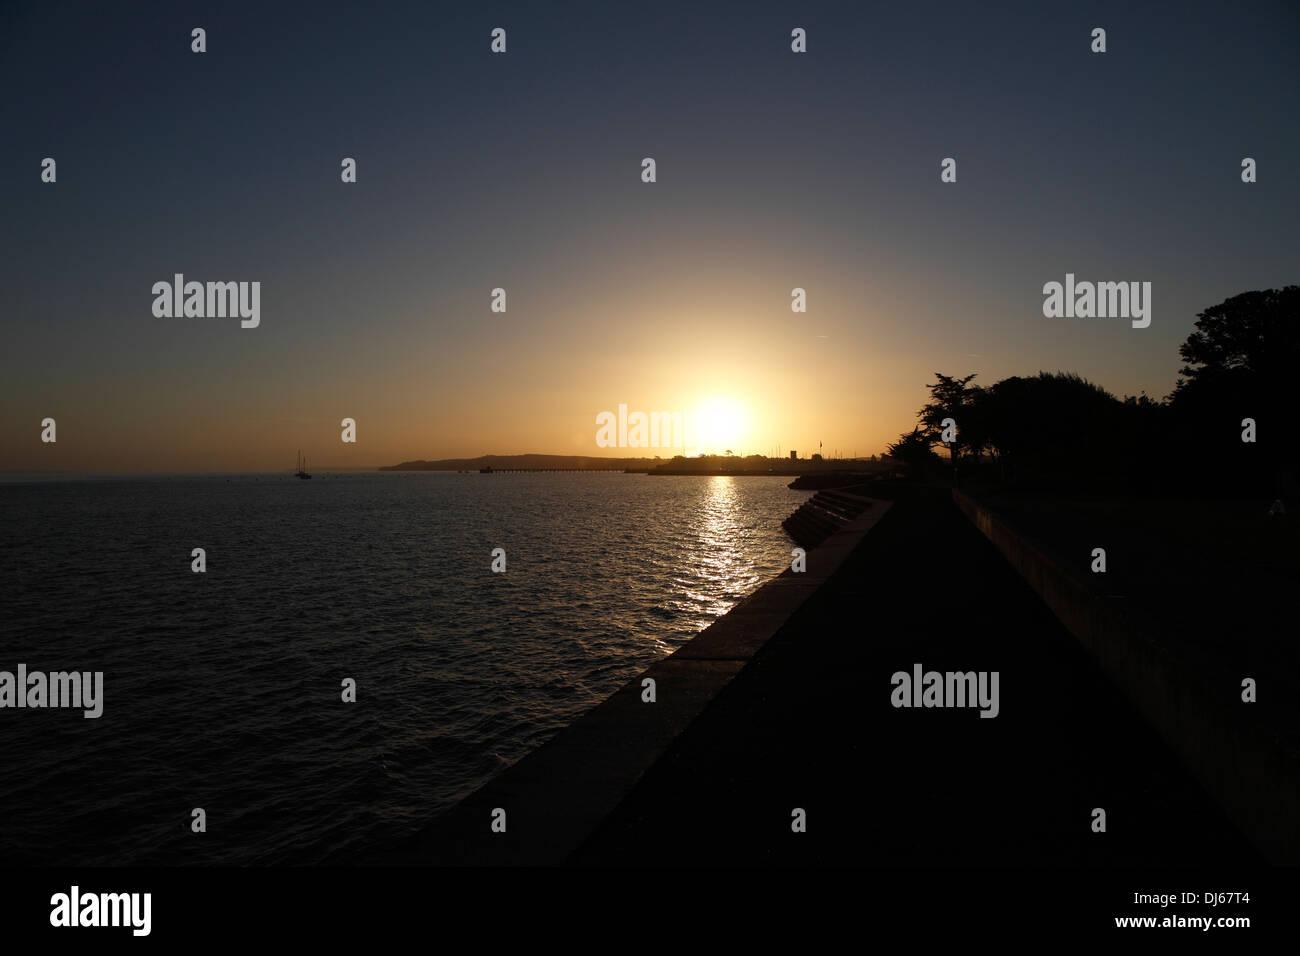 sunrise-over-yarmouth-isle-of-wight-hampshire-england-DJ67T4.jpg